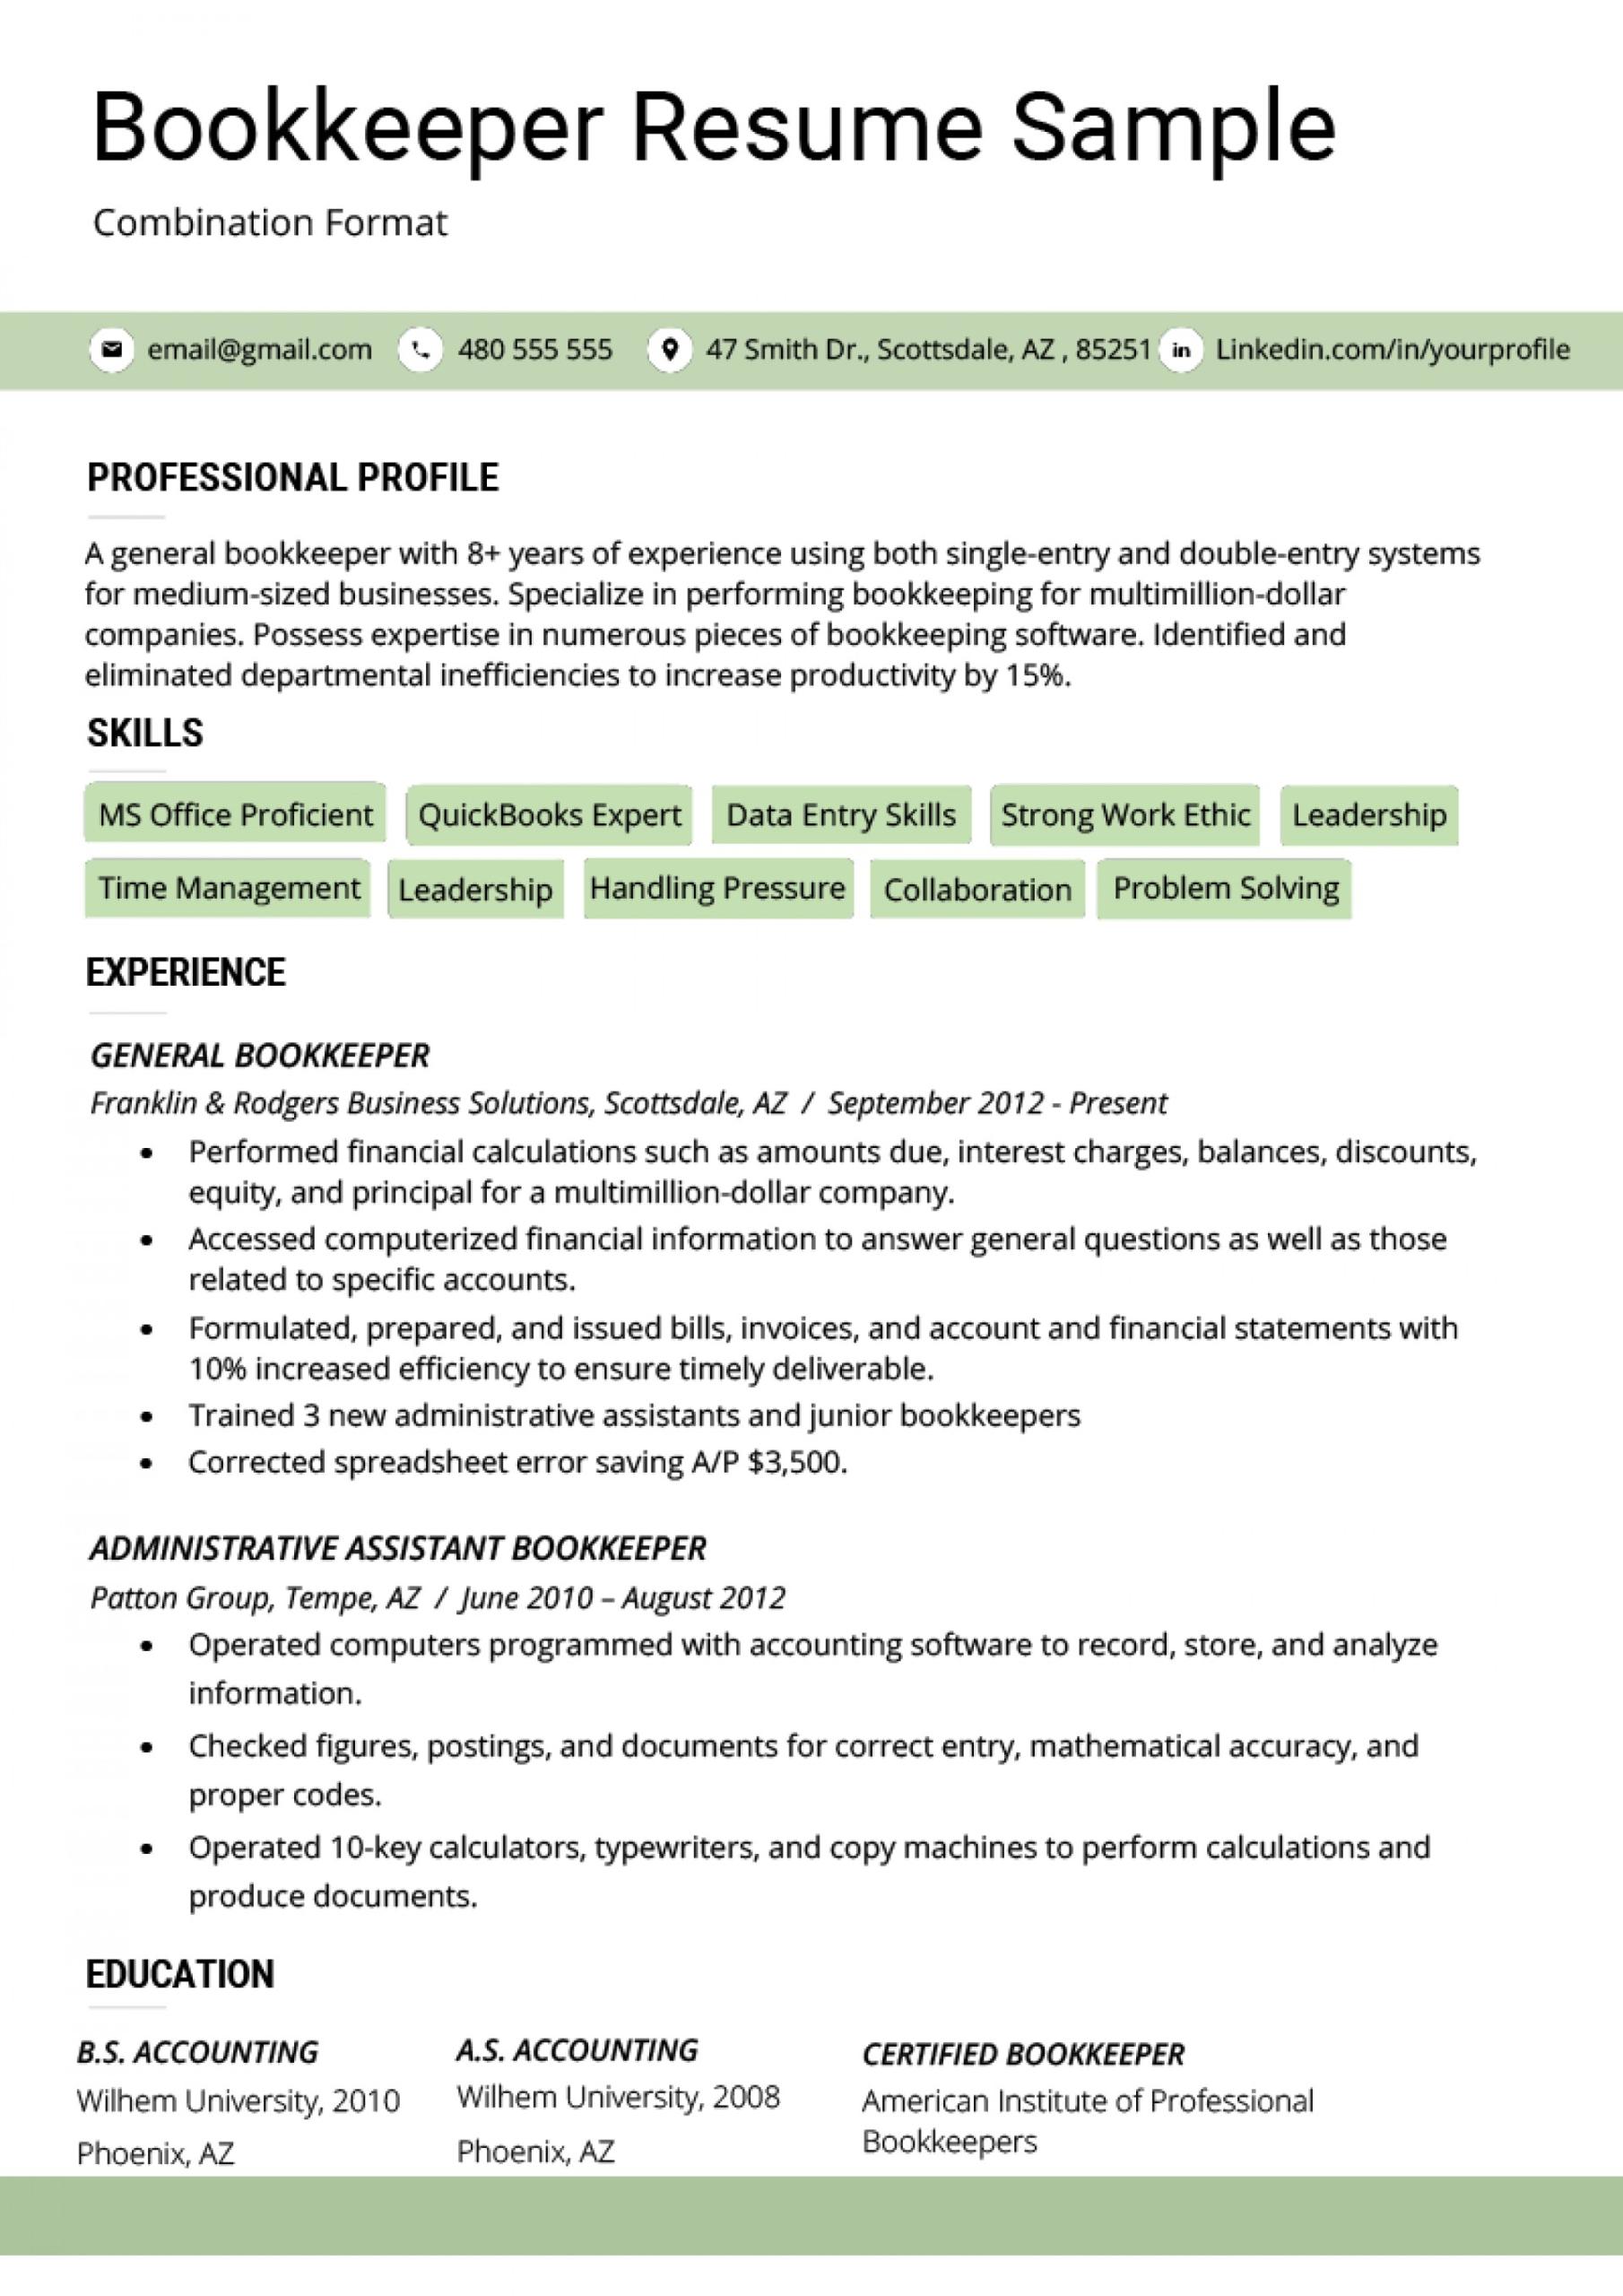 021 Combination Resume Template Word Bination Format Inside Combination Resume Template Word